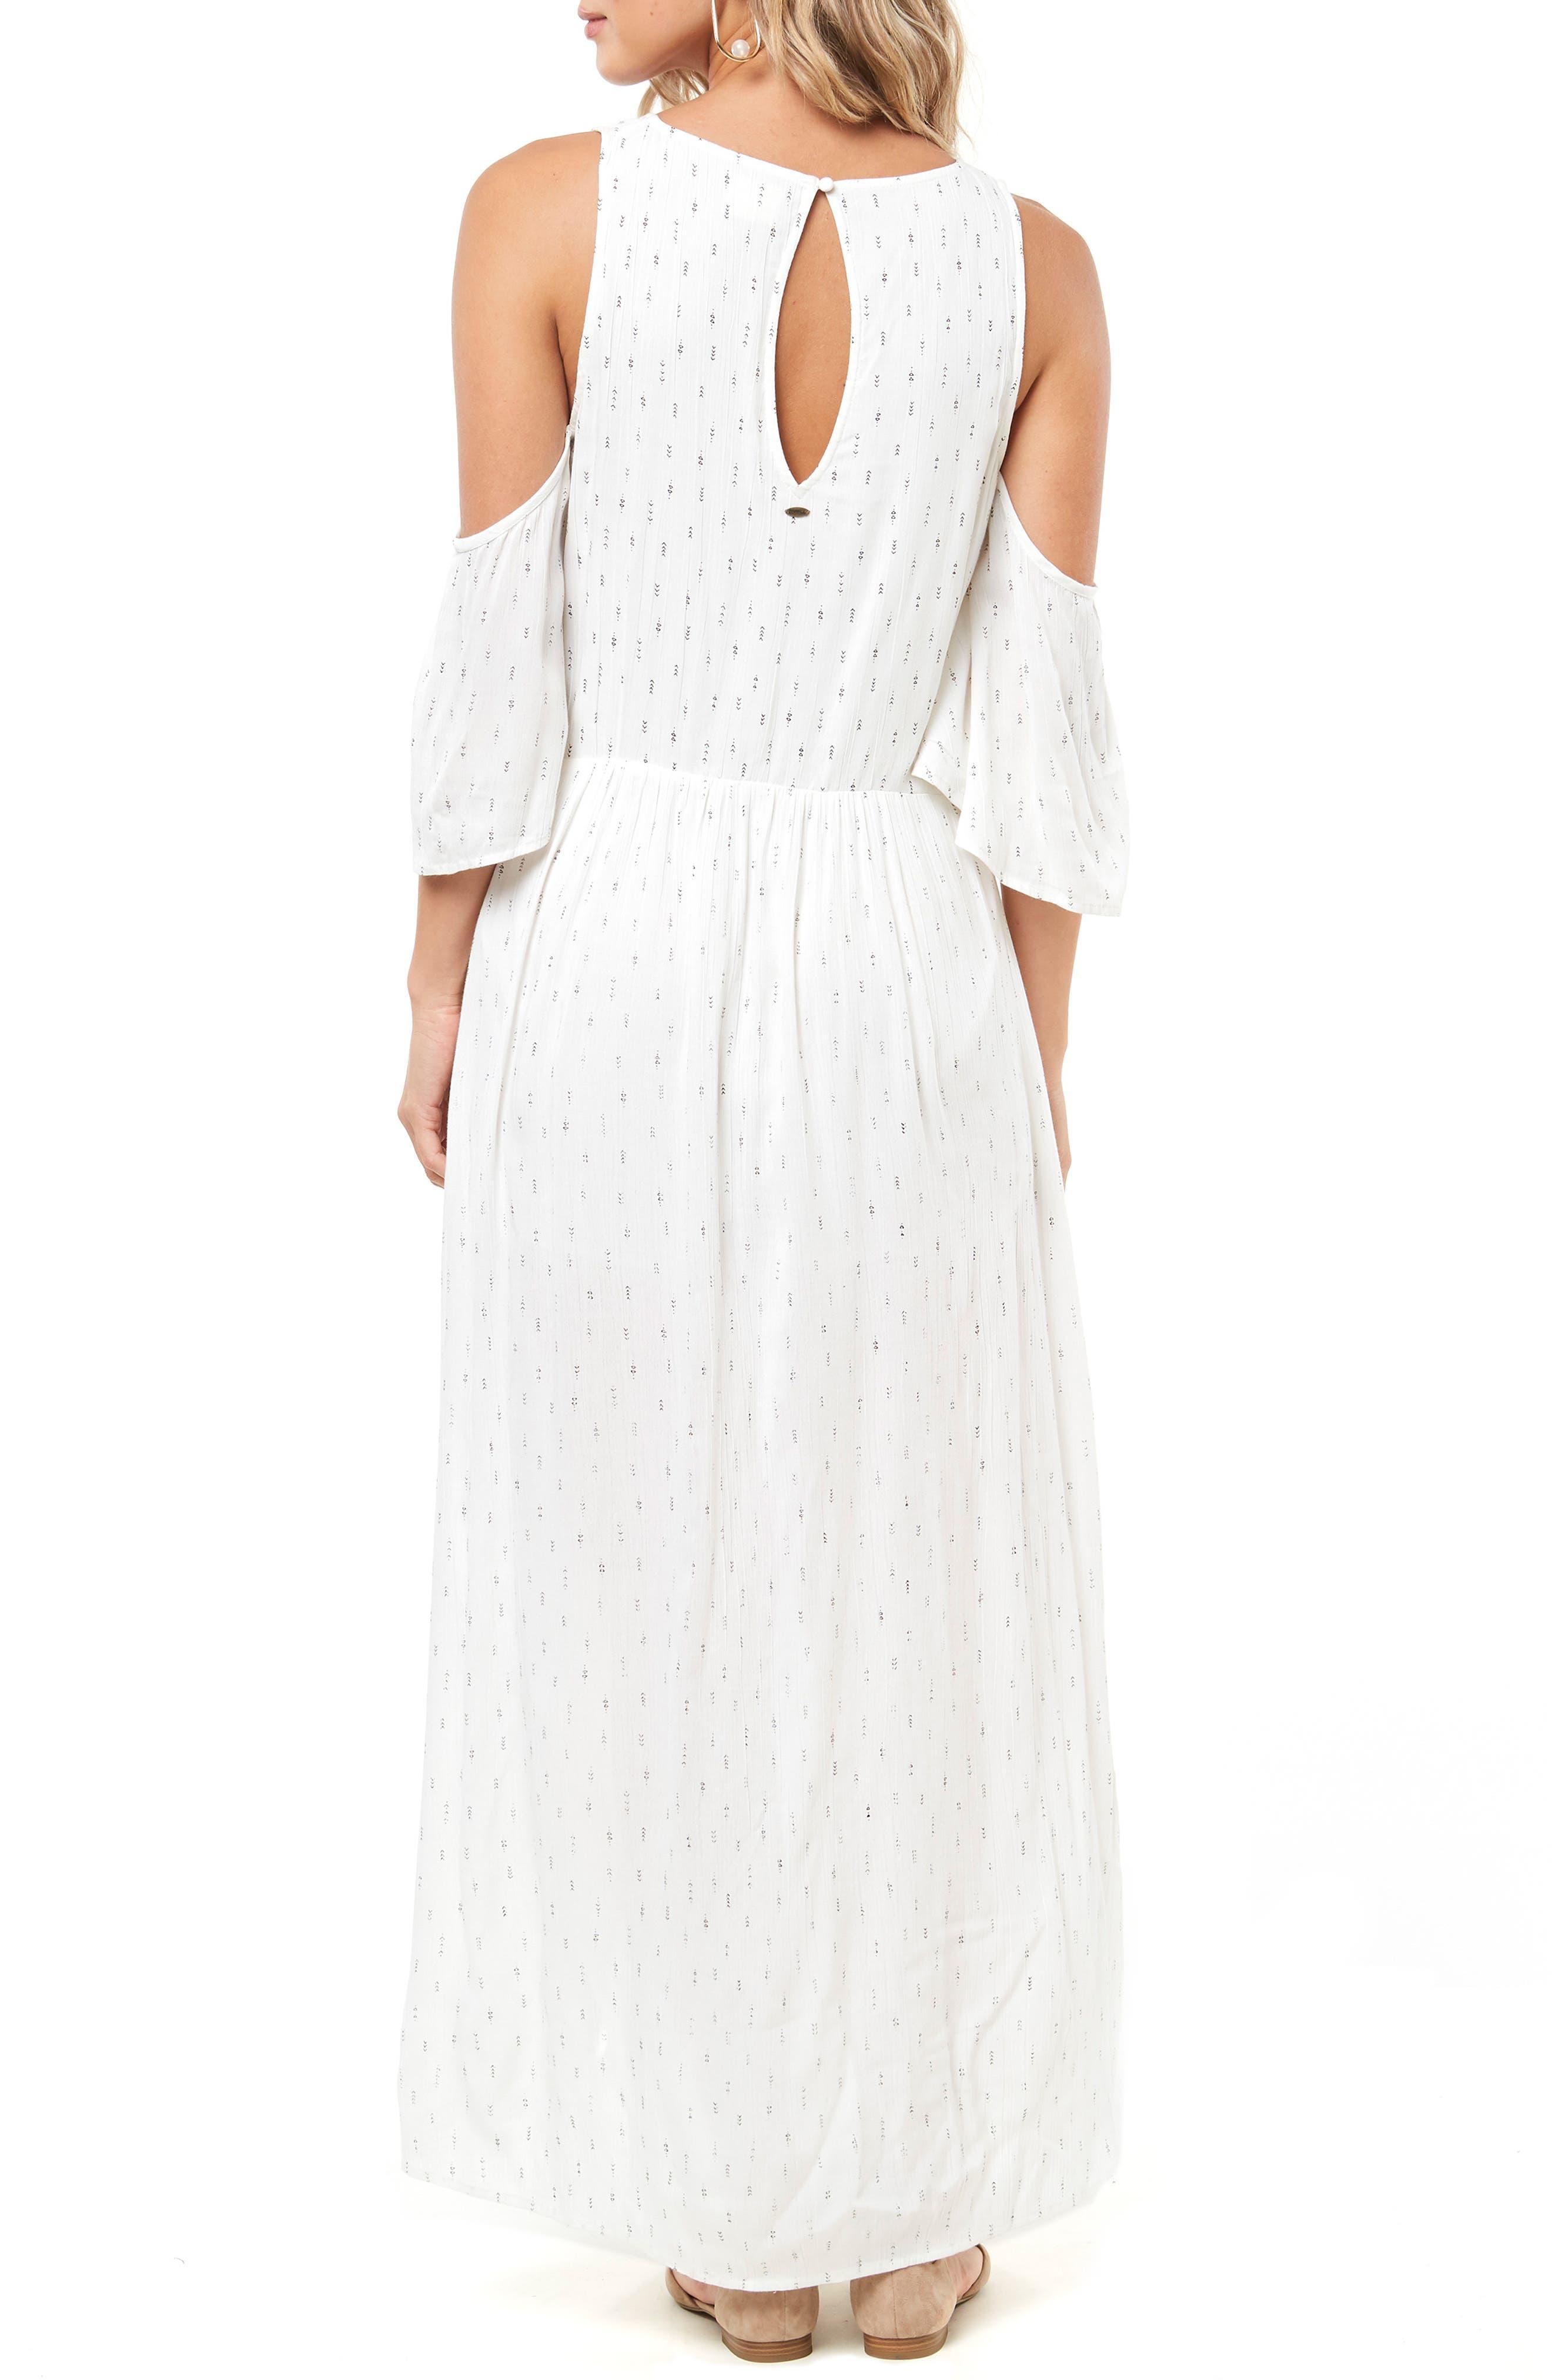 Blake Cold Shoulder Maxi Dress,                             Alternate thumbnail 2, color,                             NAKED